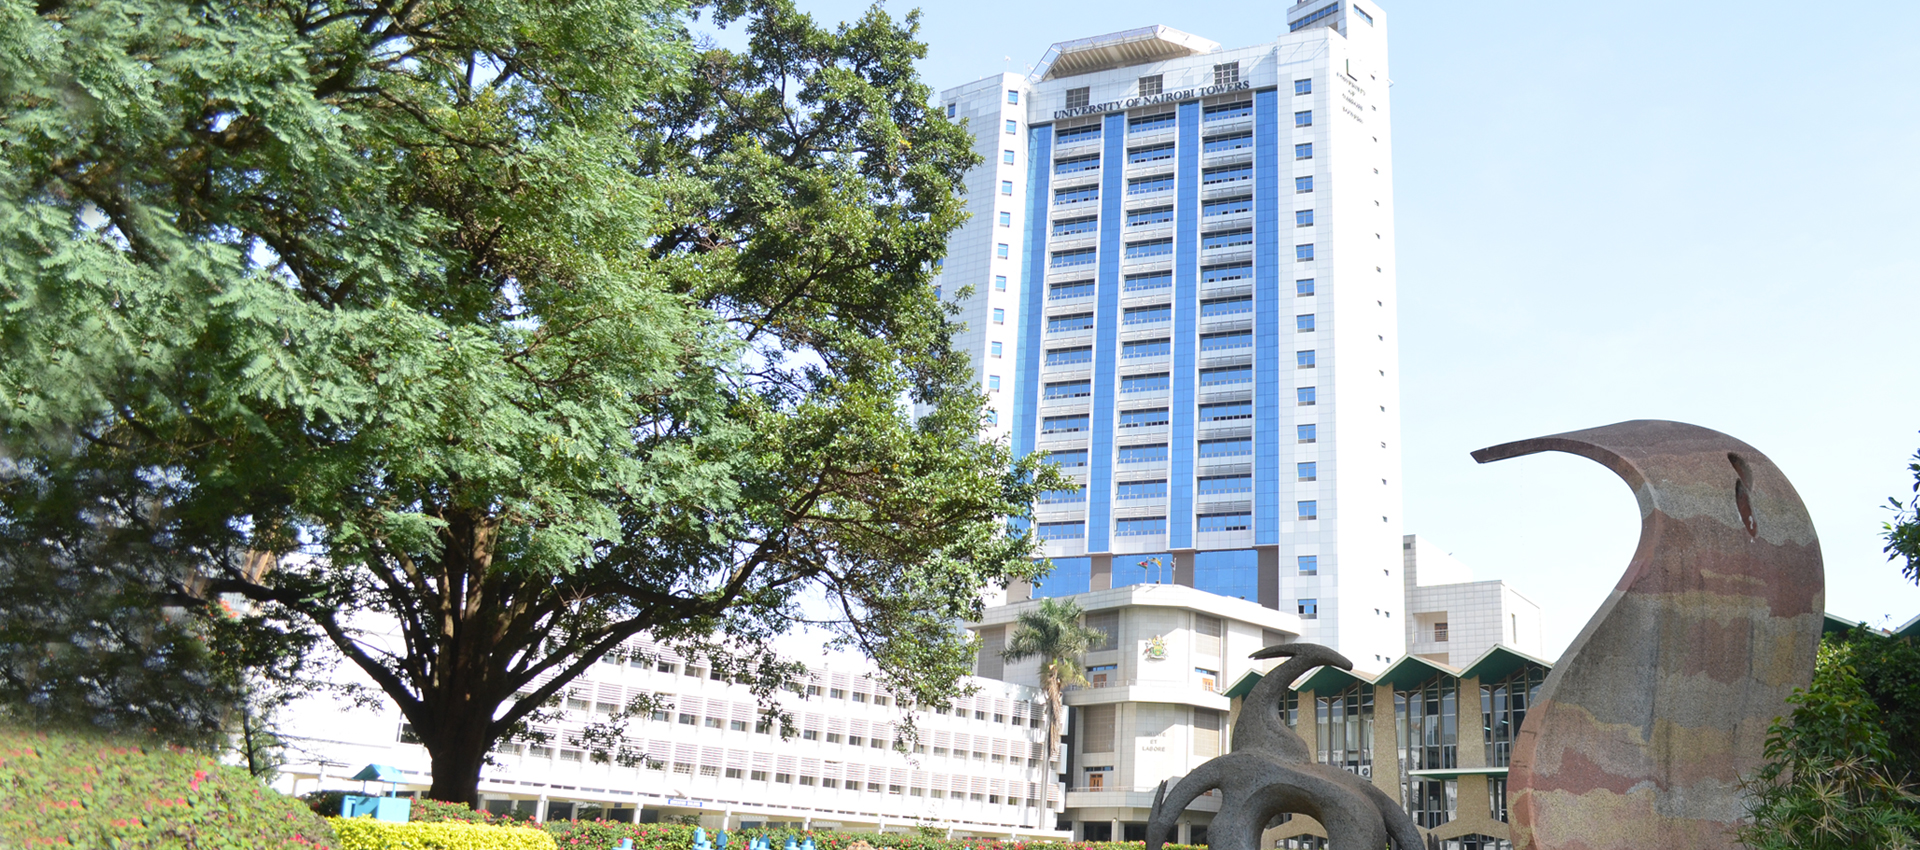 IDS | University of Nairobi Overview